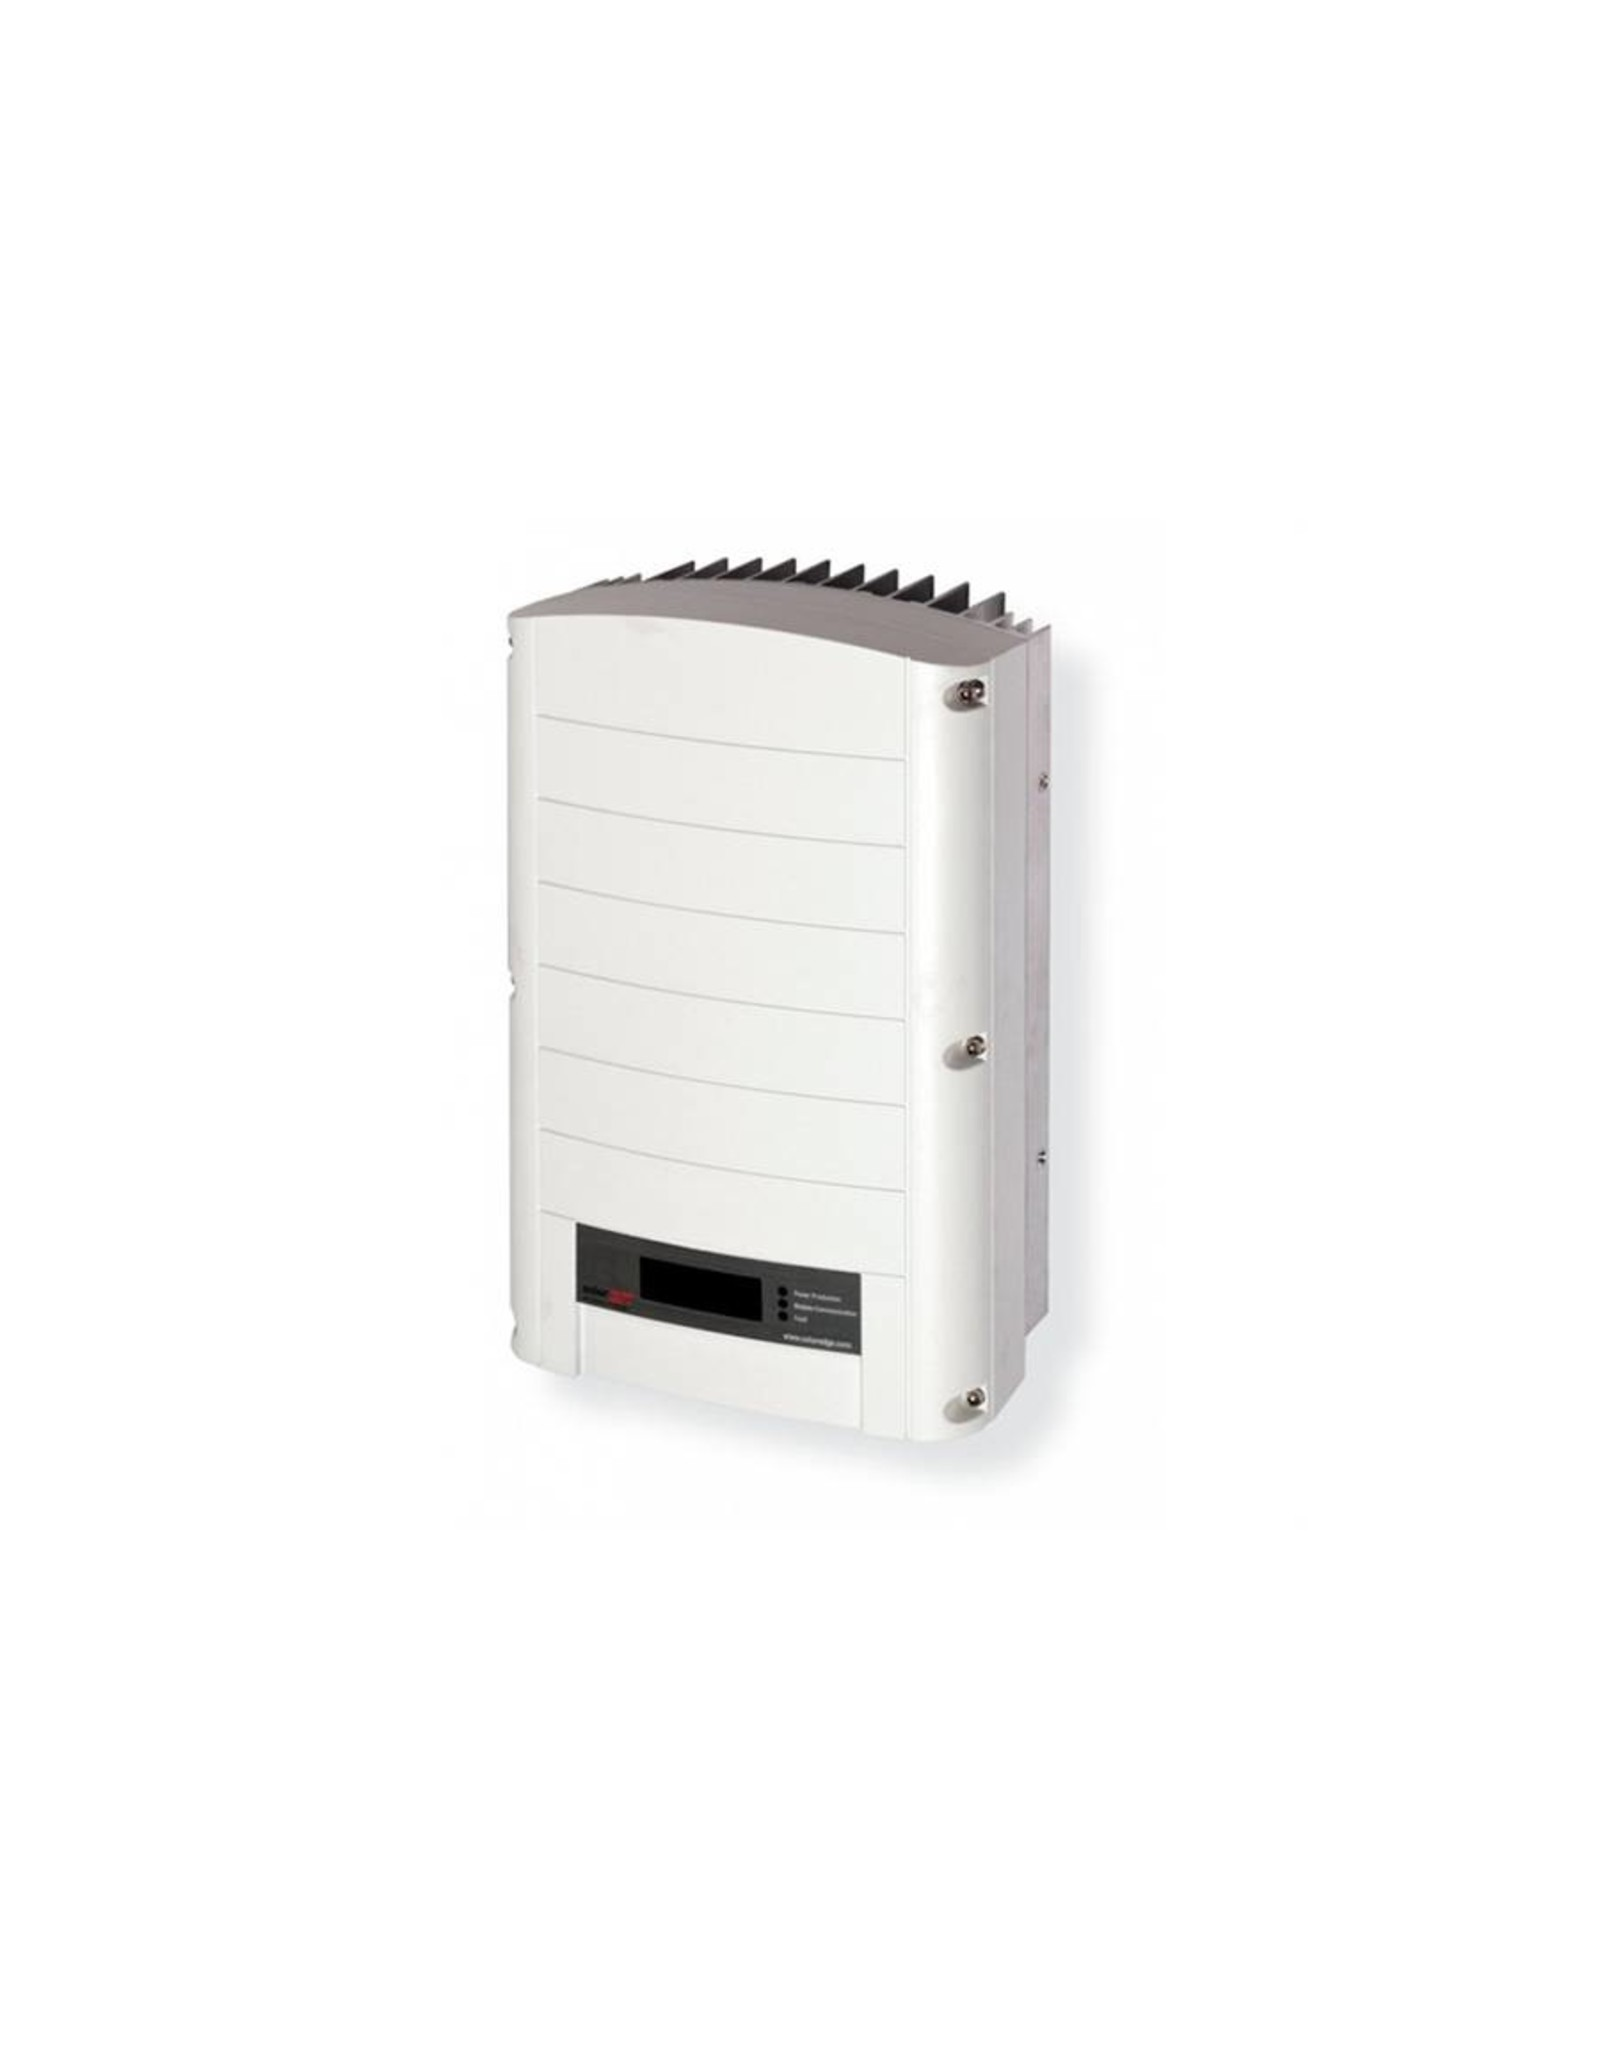 SolarEdge SolarEdge SE27.6K-RW000NNN2 / SE27.6K-RW000NGN2 driefase omvormer 27.6 kW, ethernet / gsm